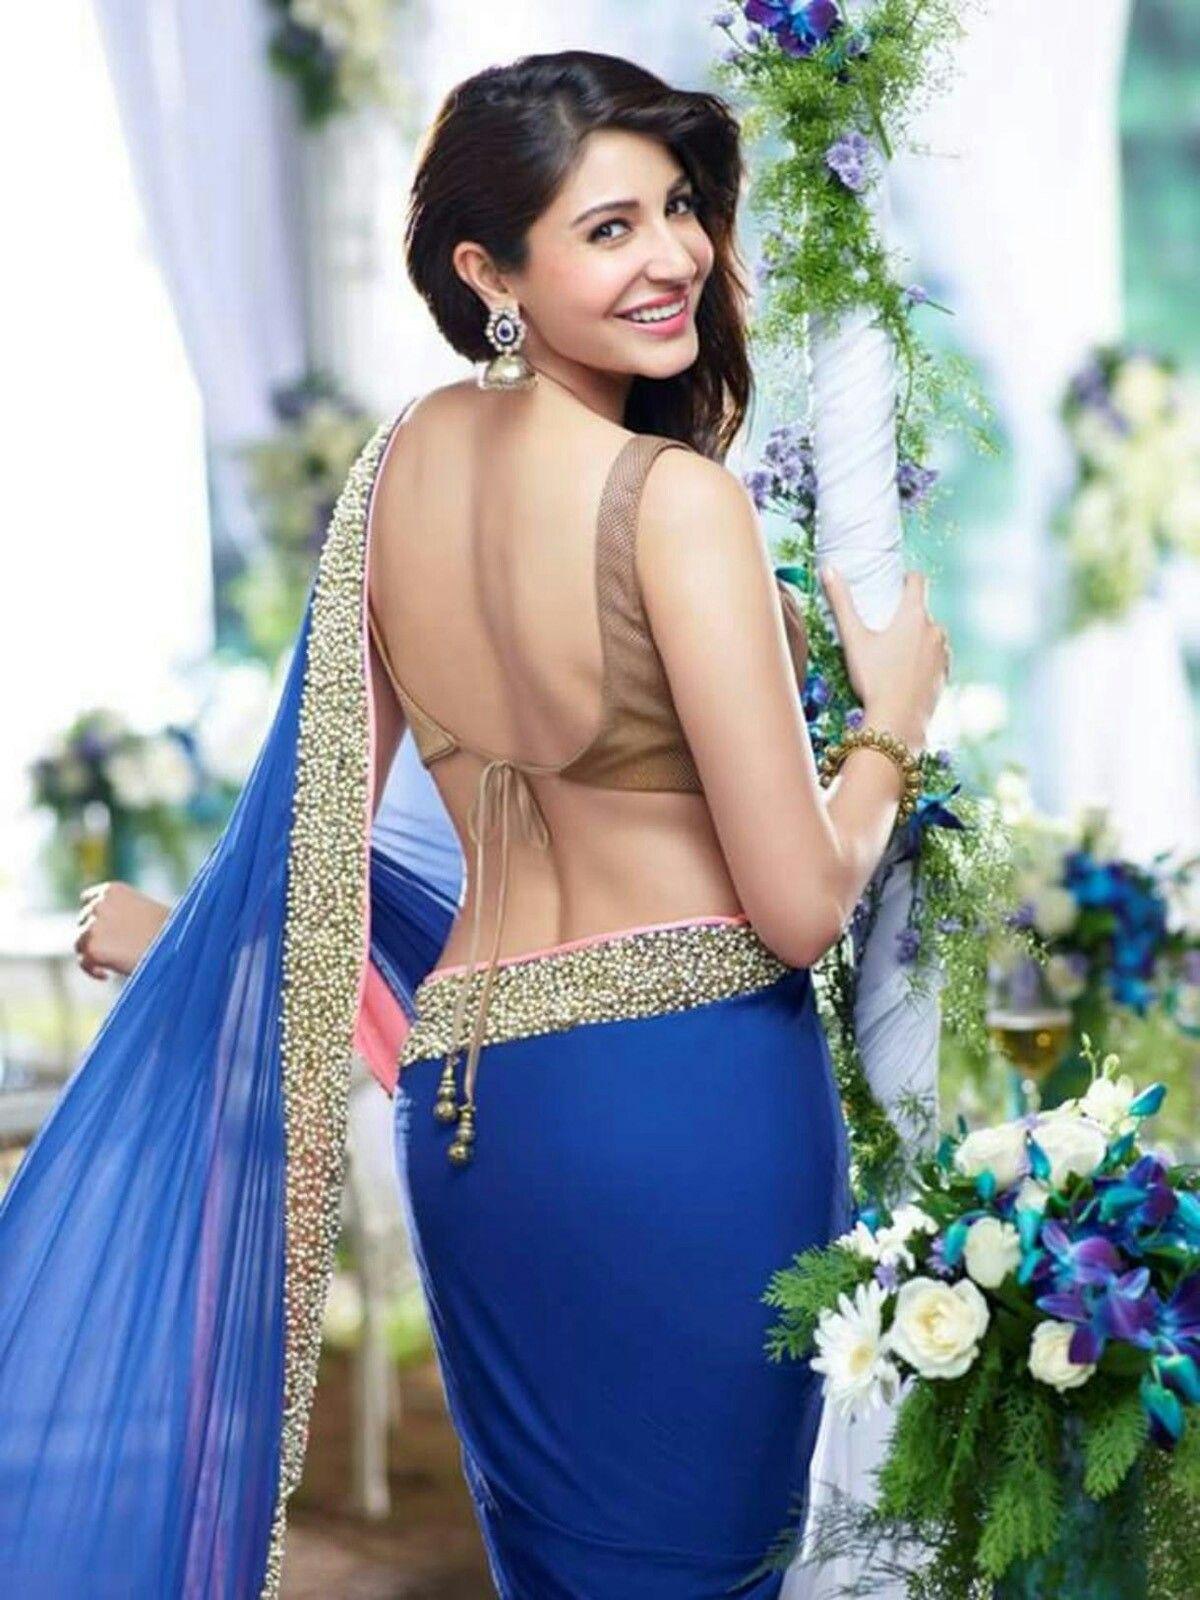 pinkavya singh on hot actresses in saree | pinterest | hot